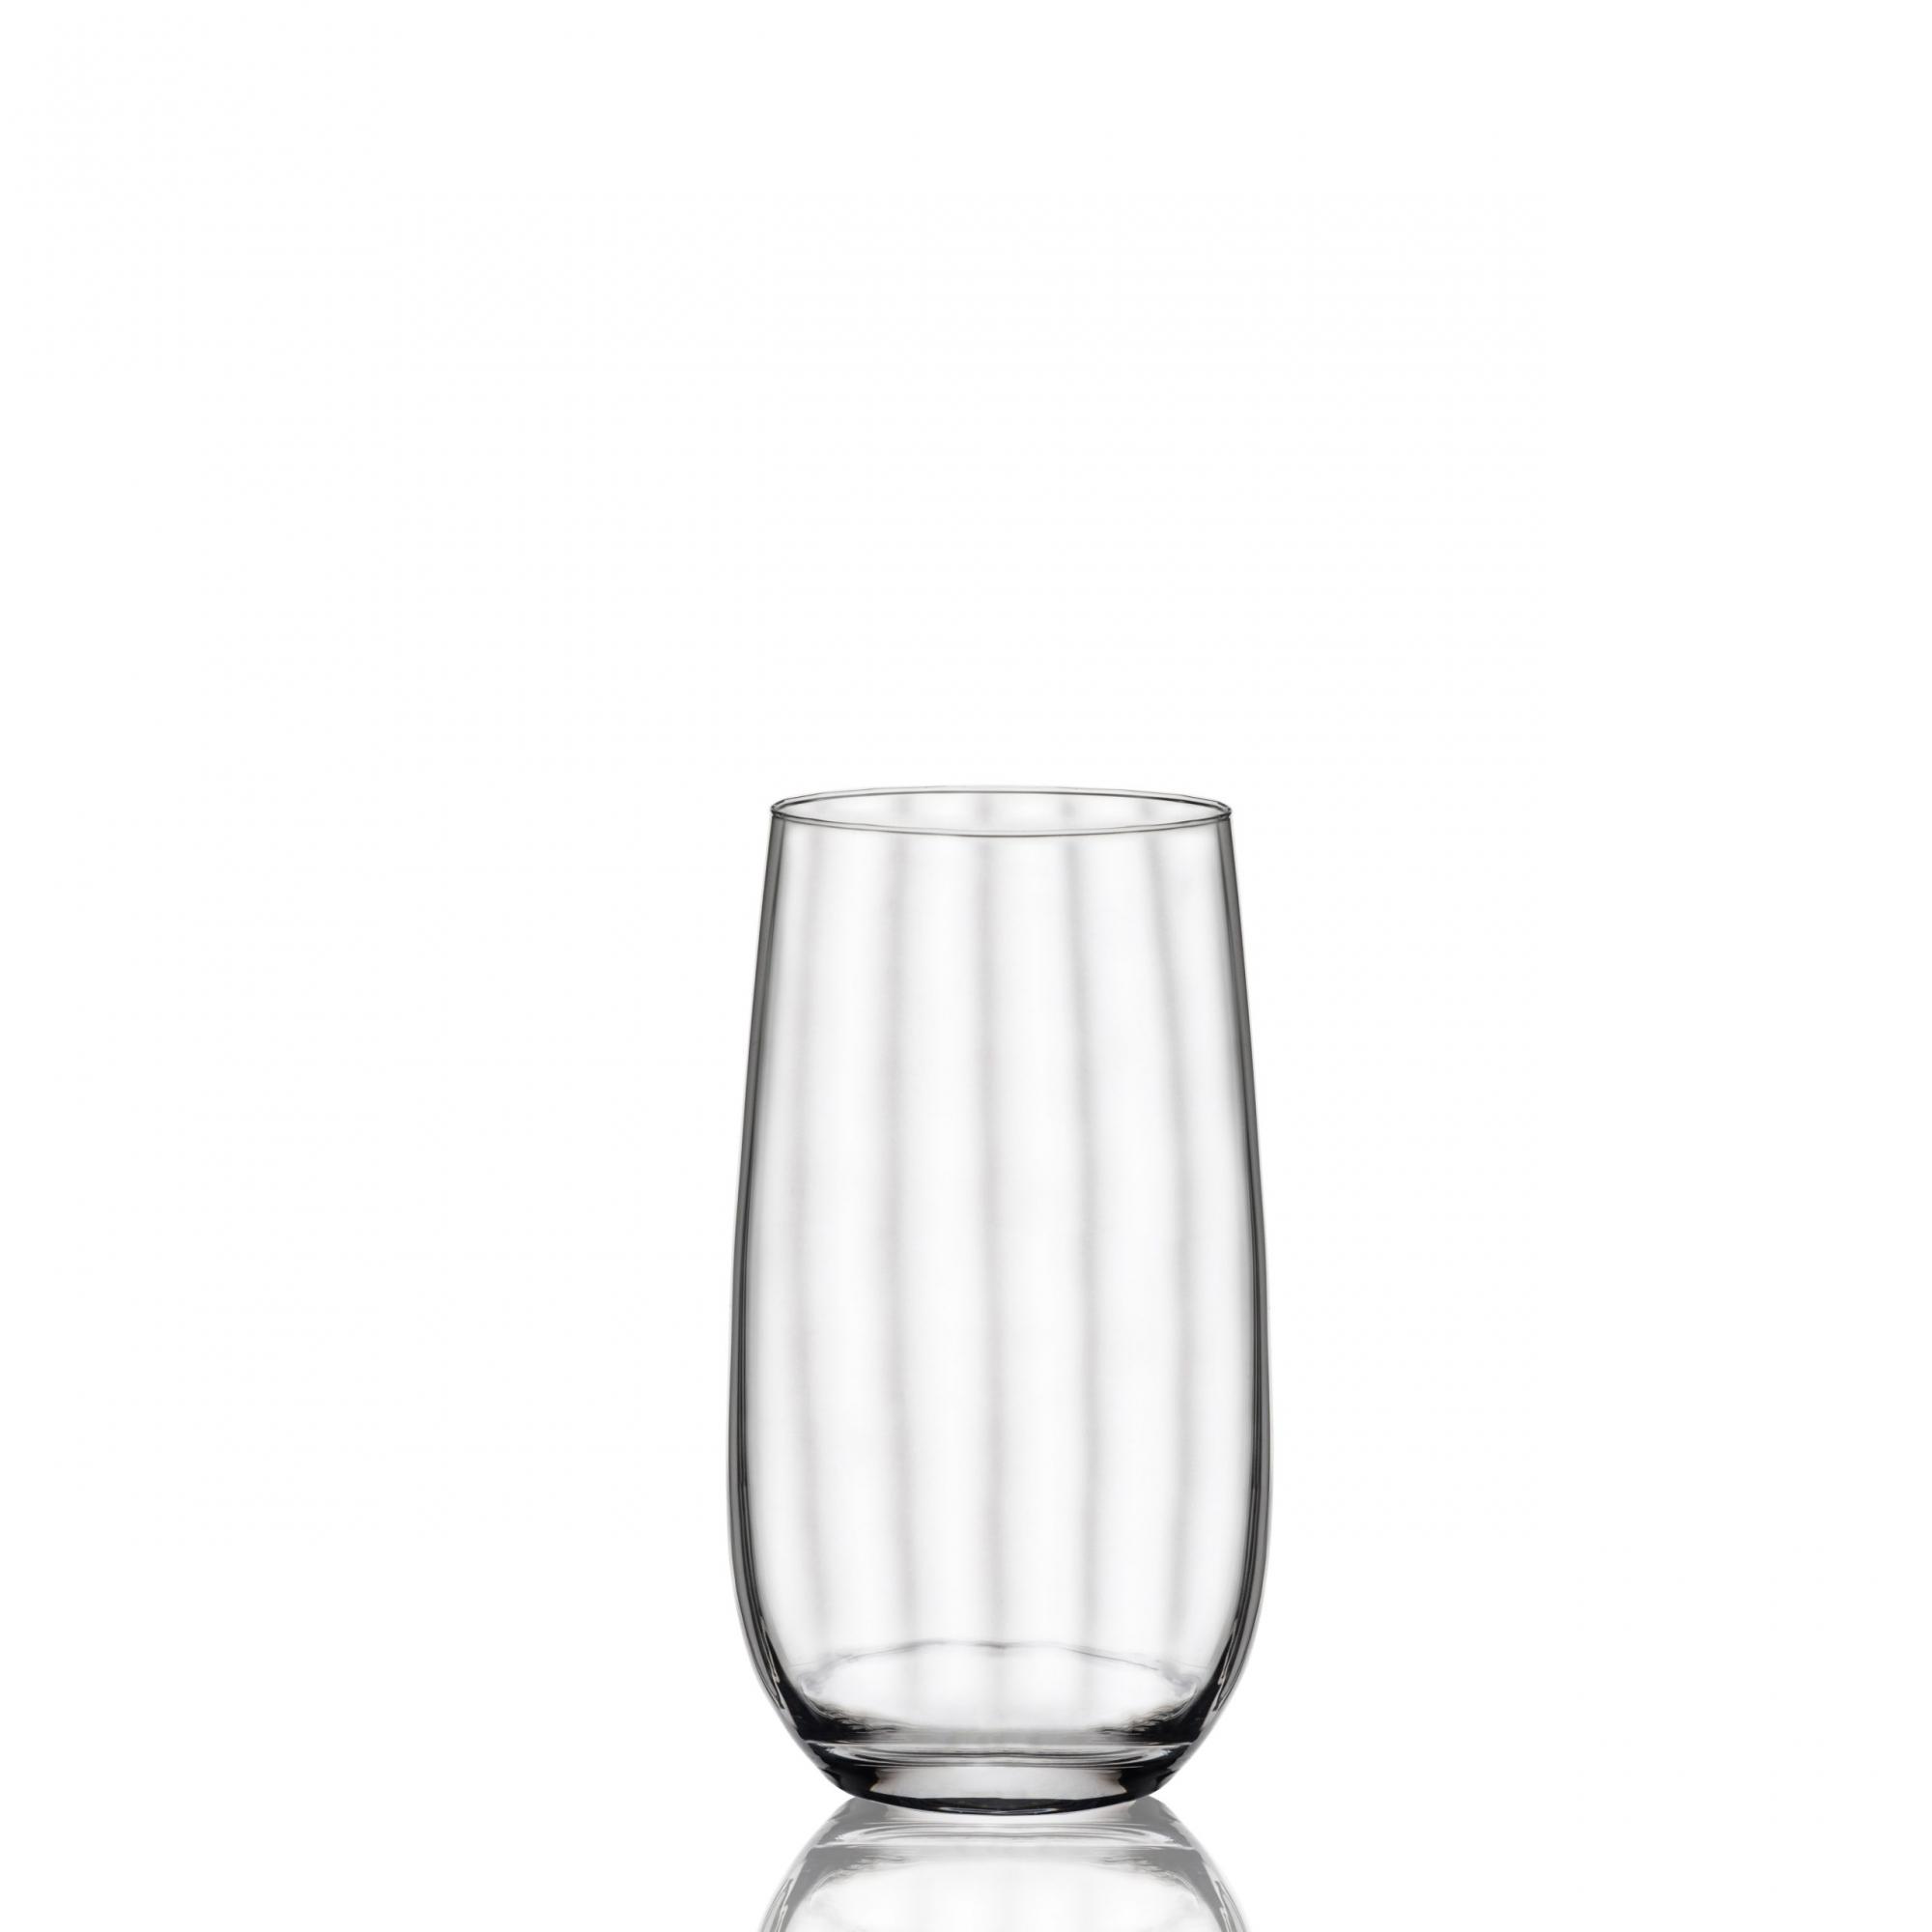 Conjunto C/06 Copos De Cristal 490Ml Long Drink Proper Effect Oxford